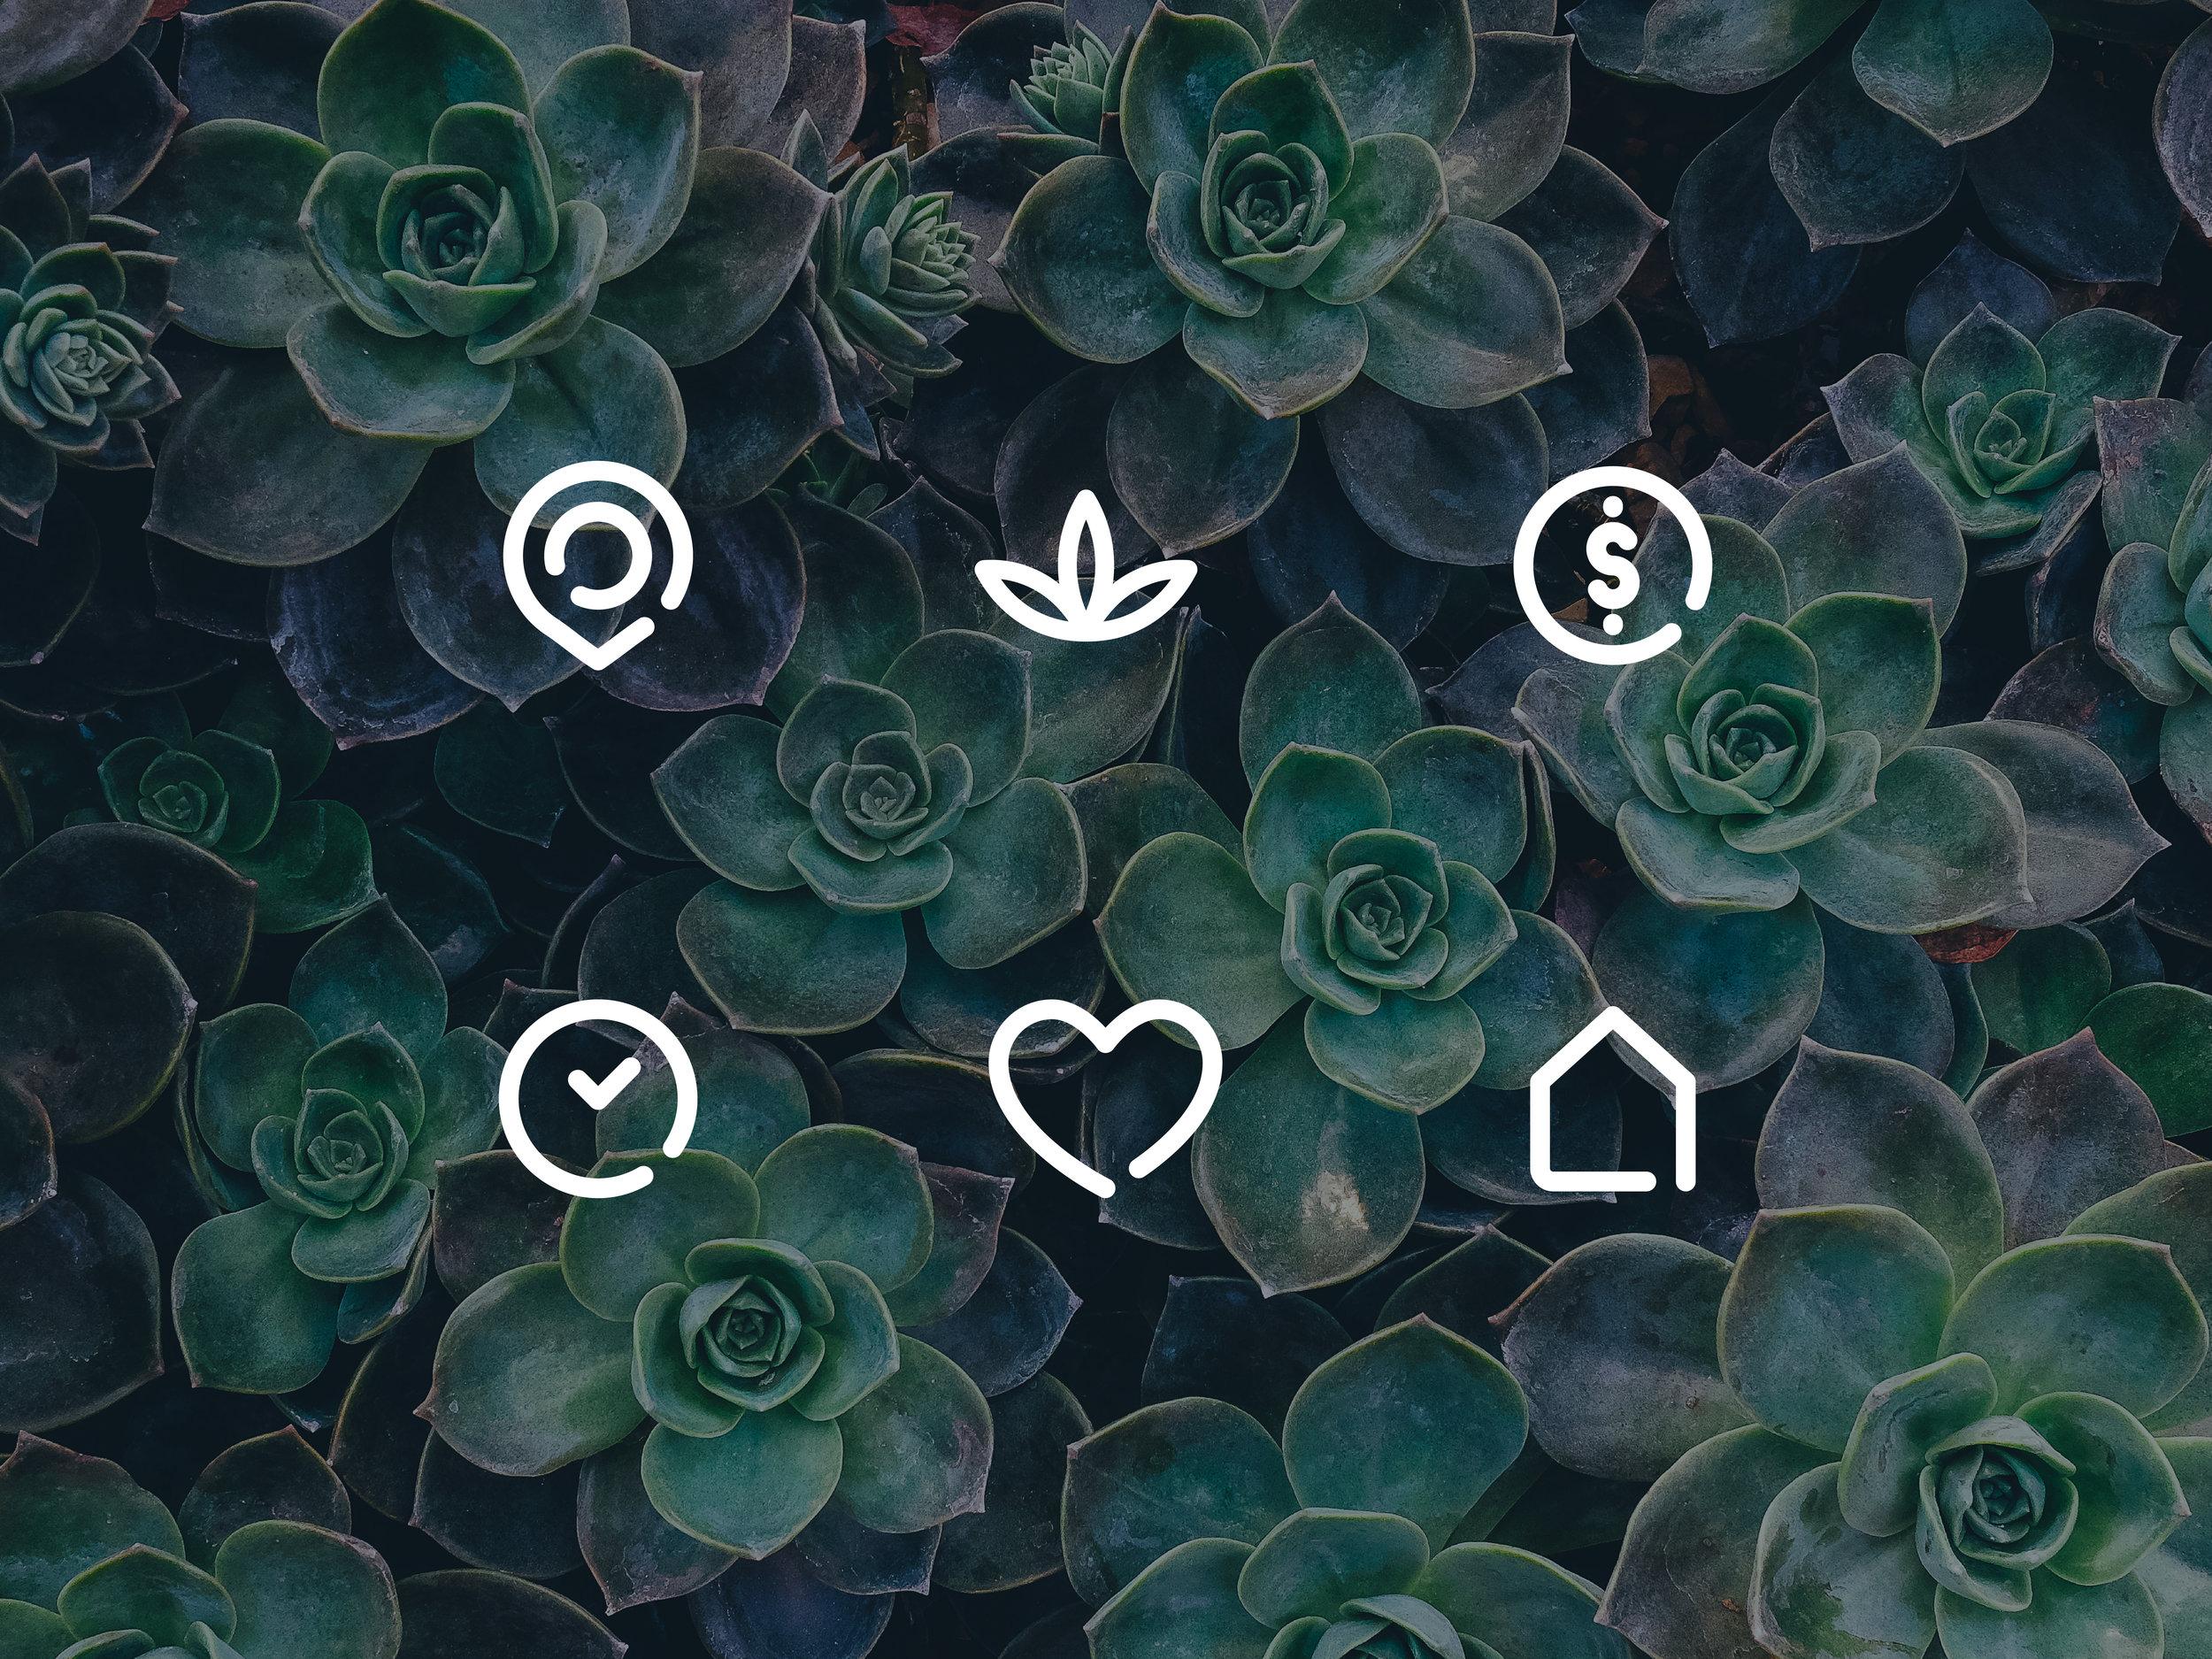 numi-icons-01.jpg